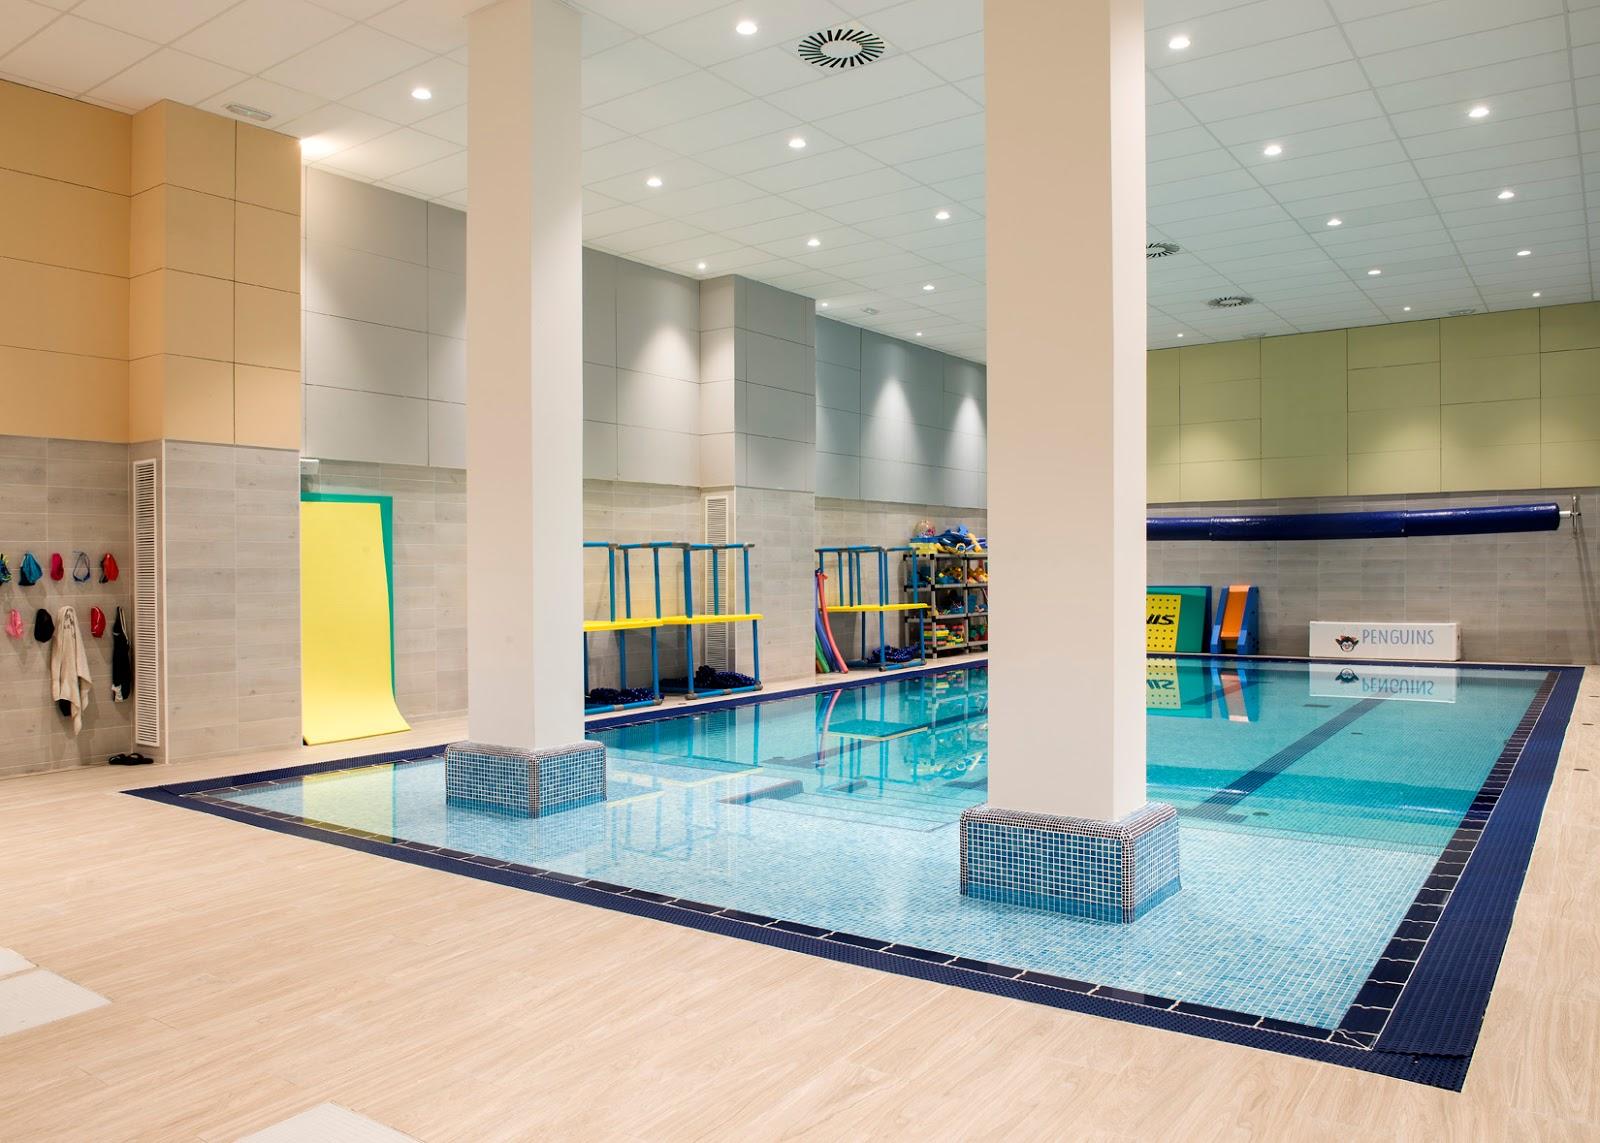 Pia Capdevila Interiorismo Eventos Penguins Barcelona Swimming School